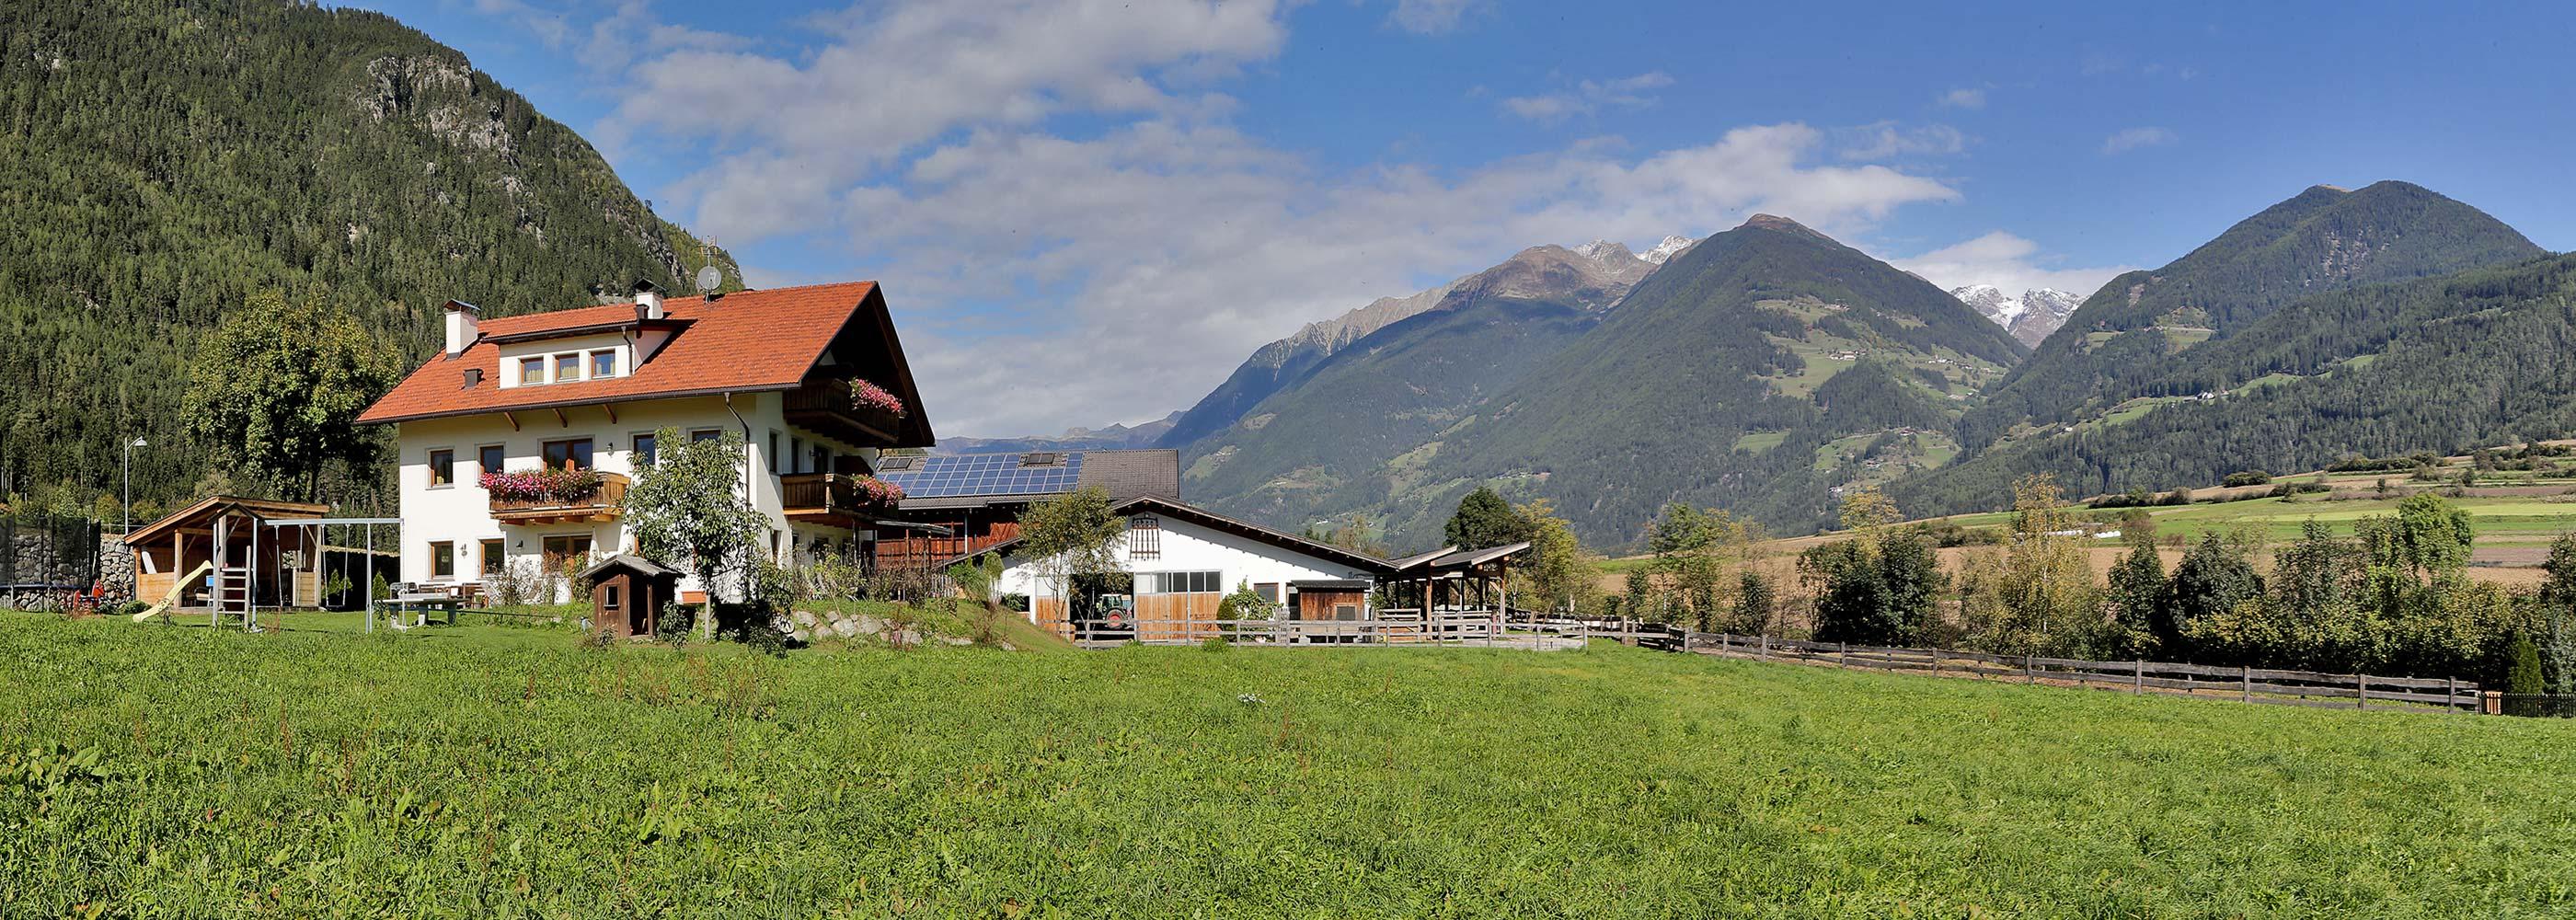 pano-farm-vacation-south-tyrol-apartment-holidays-bruneck